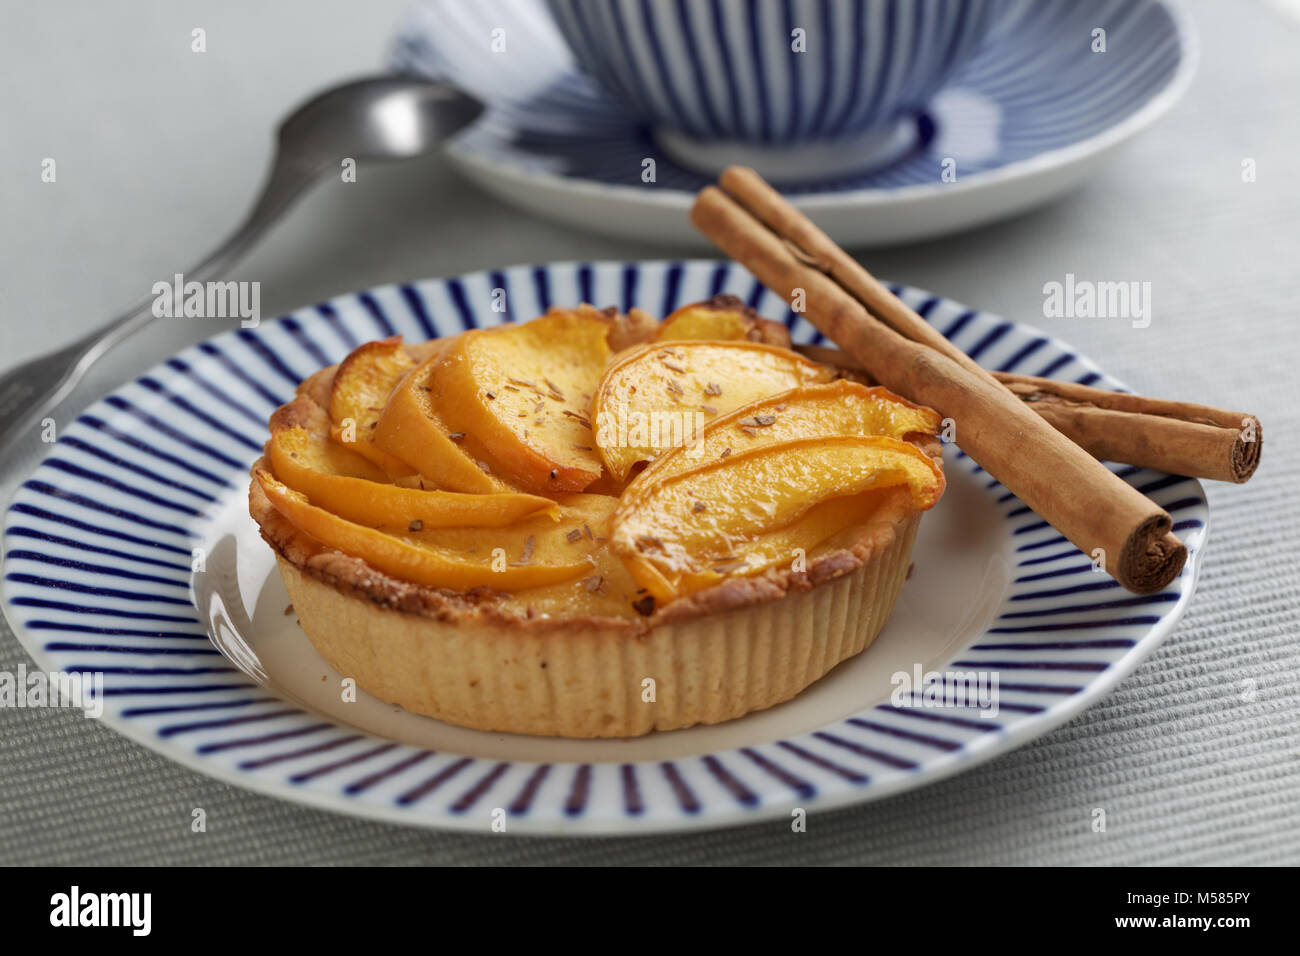 Peach tart and cinnamon sticks on a plate closeup - Stock Image